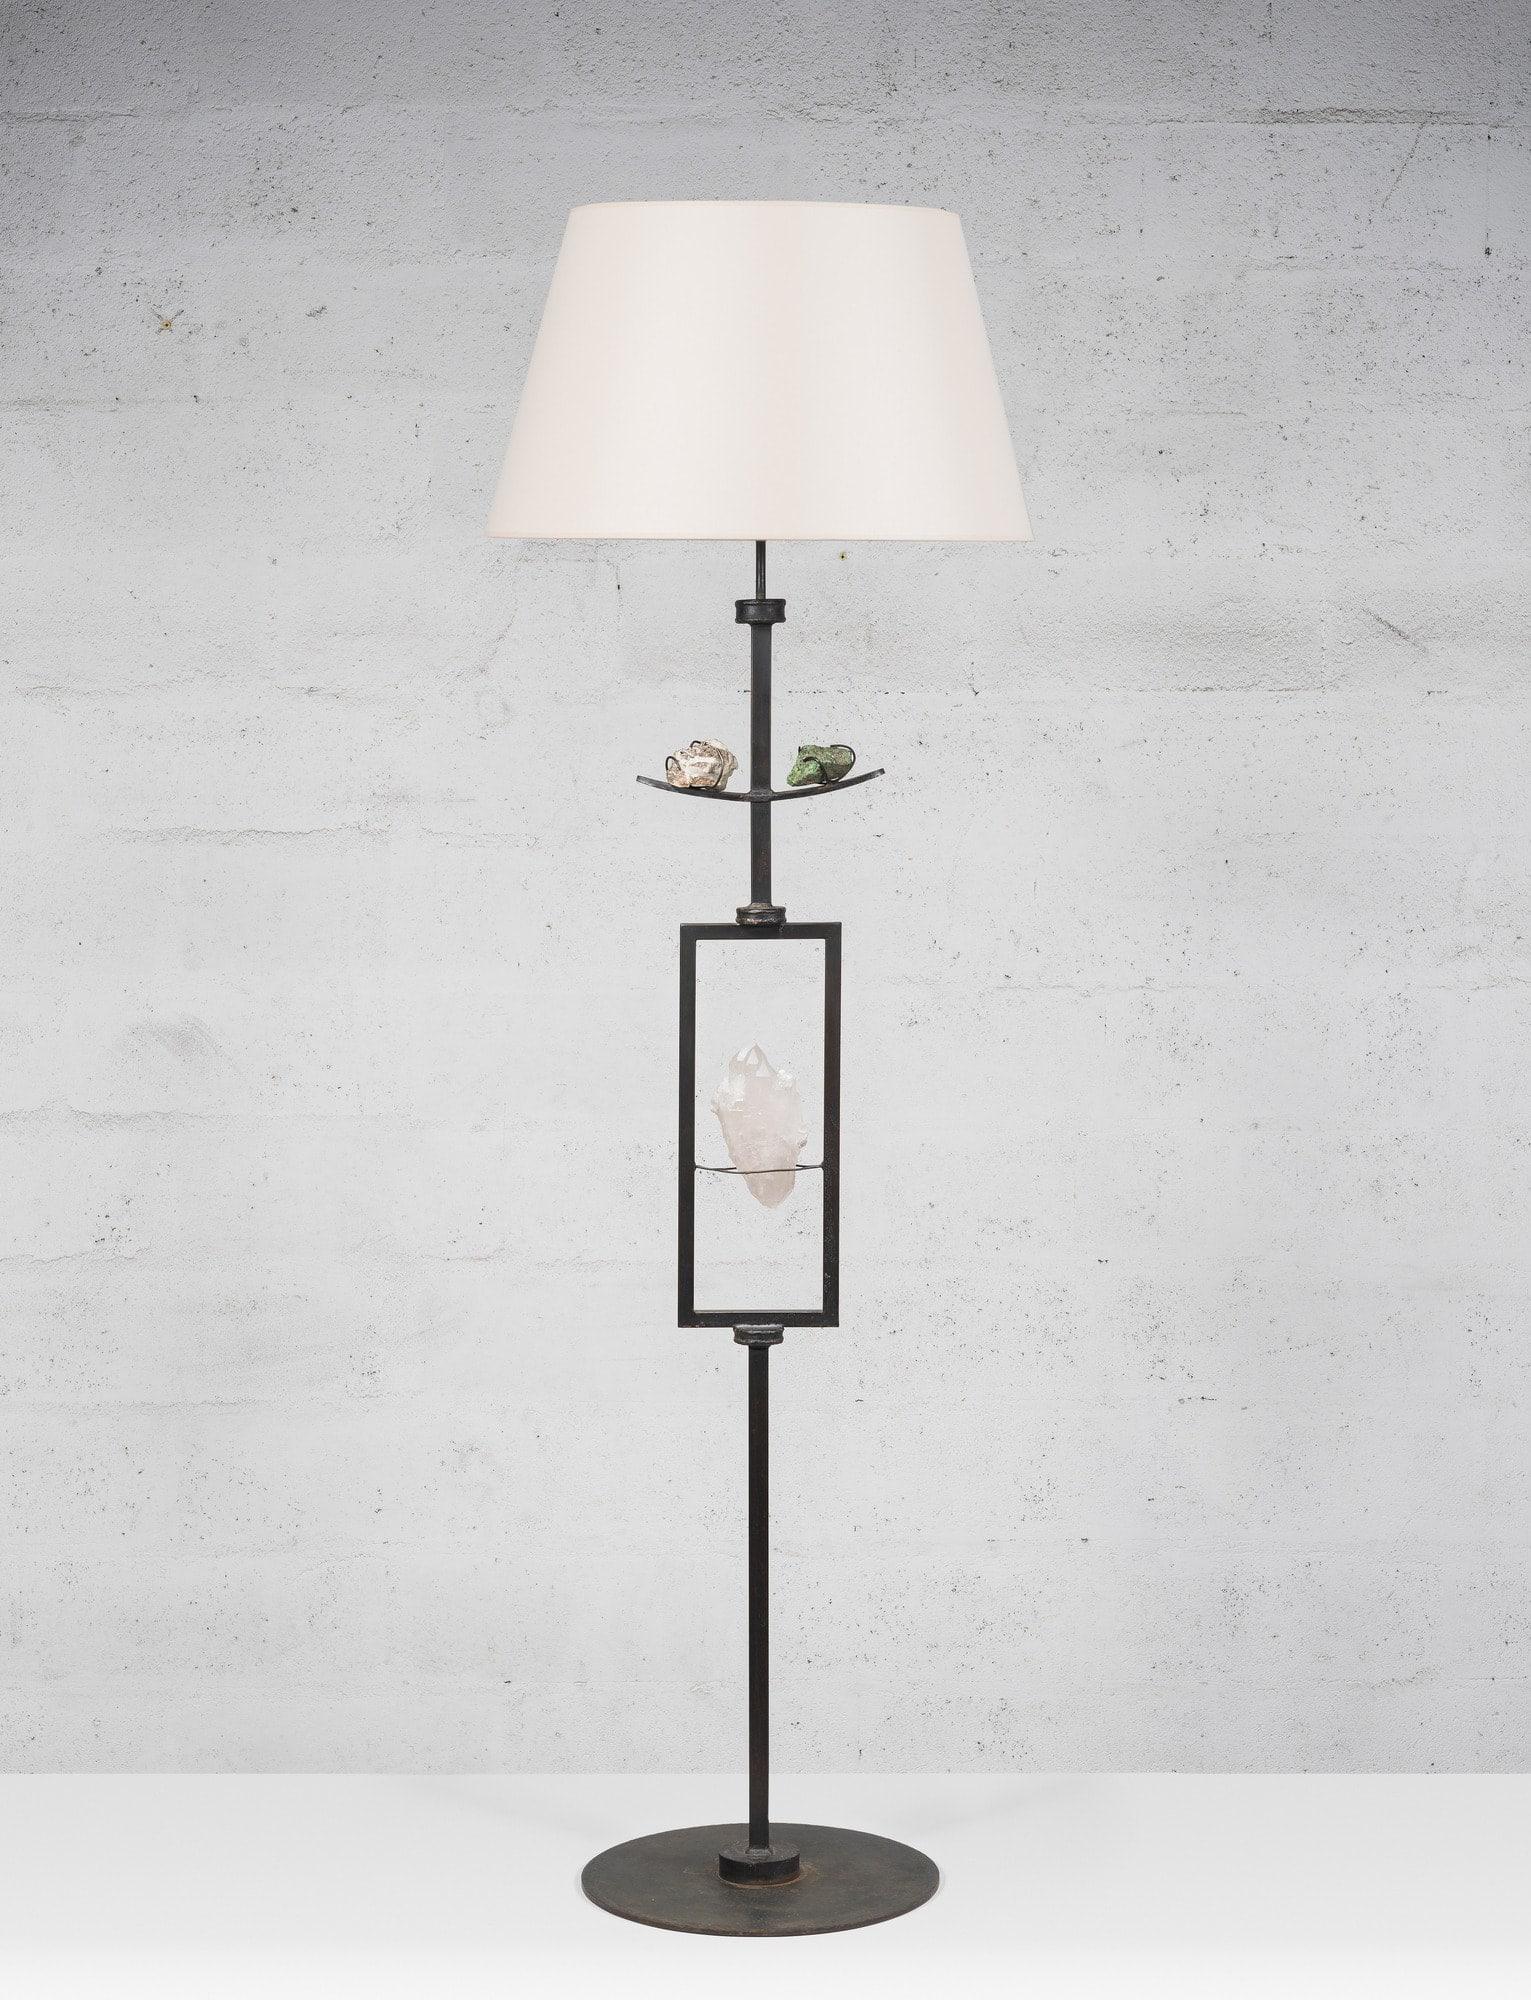 Marc Nicolas Du Plantier, Rare floor lamp, vue 01